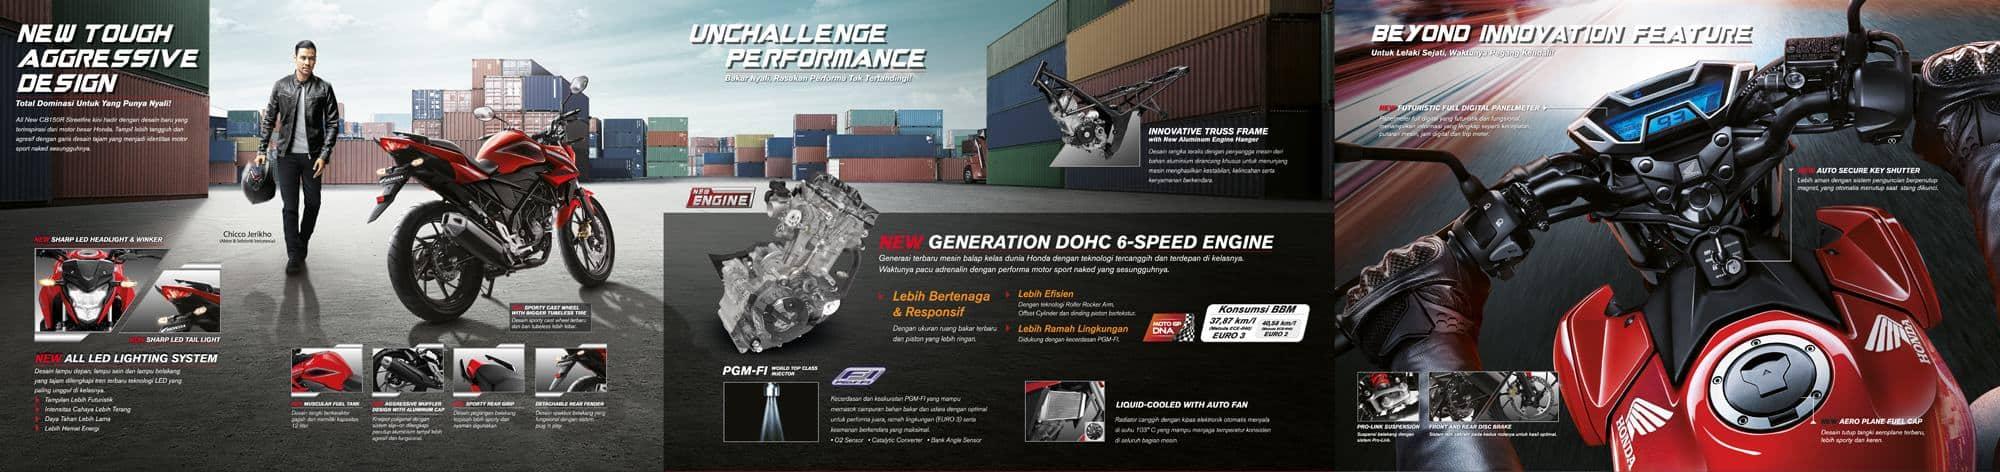 Brosur Motor Honda CB150R StreetFire 2